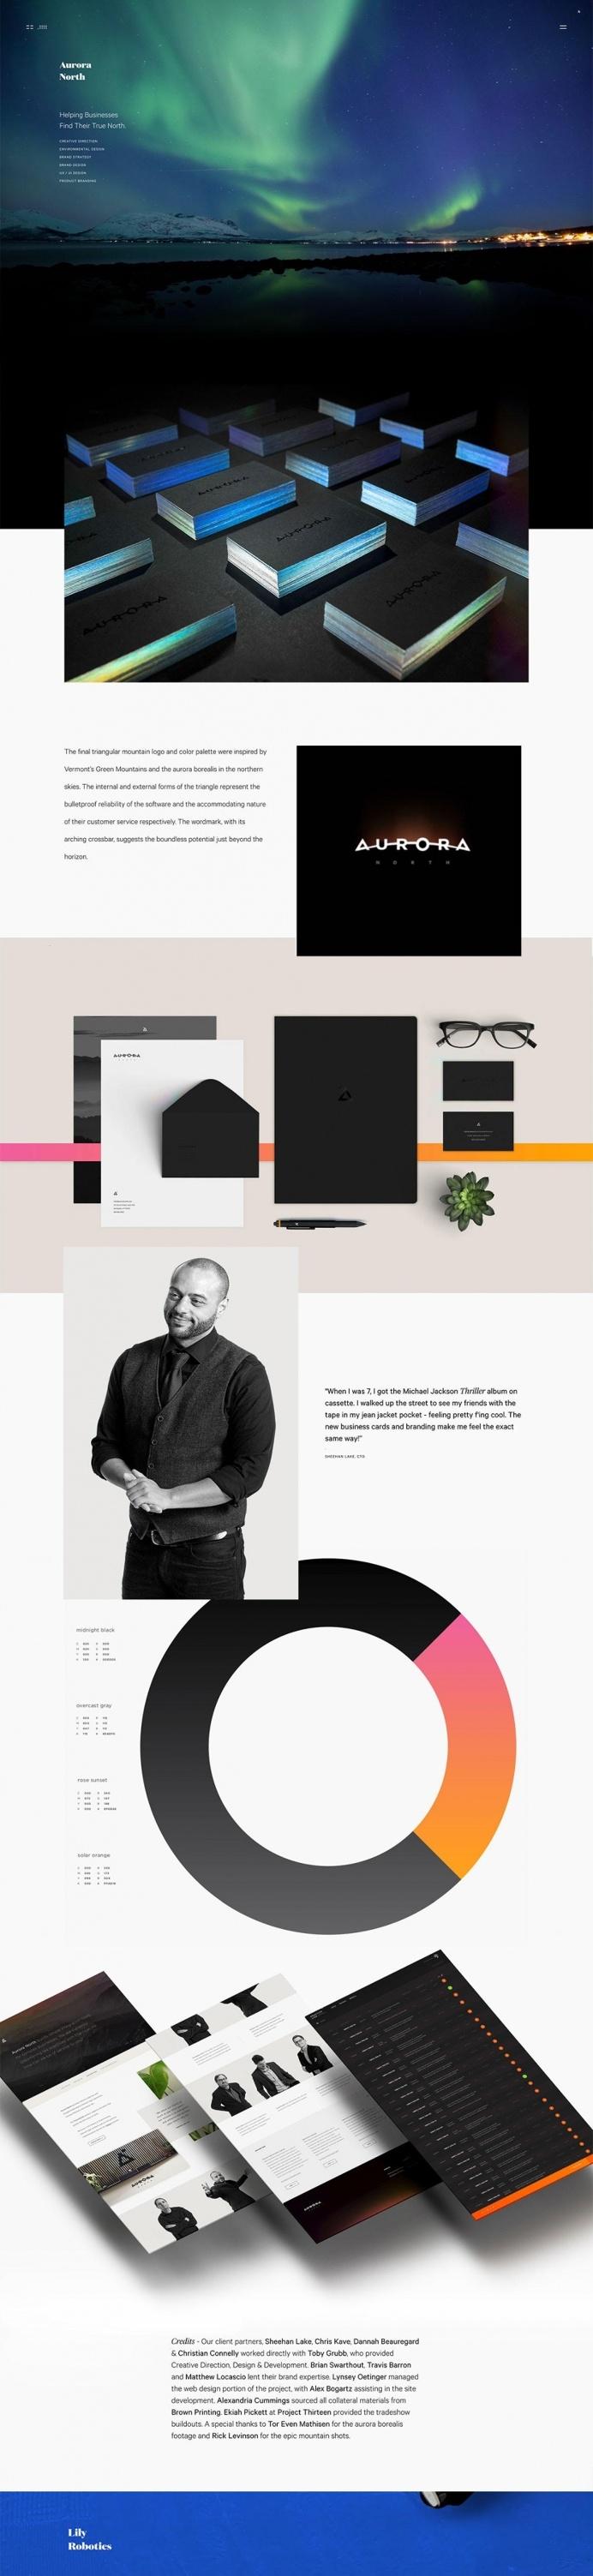 This. design - Mindsparkle Mag